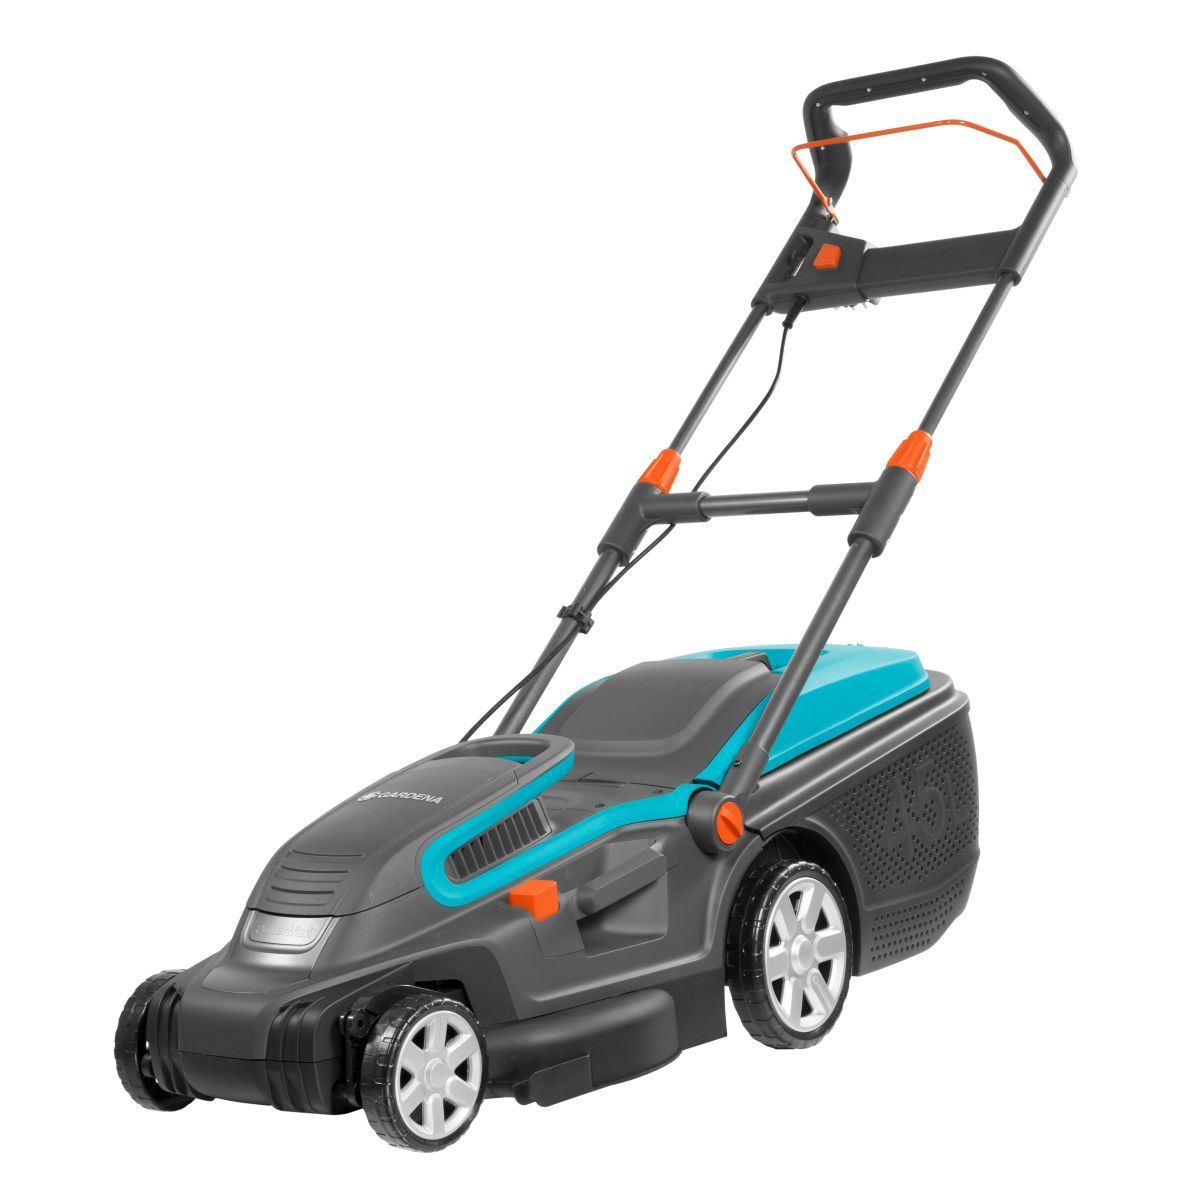 Gardena PowerMax 1800/42E - el. sekačka na trávu GARDENA® 5042-20 L-11